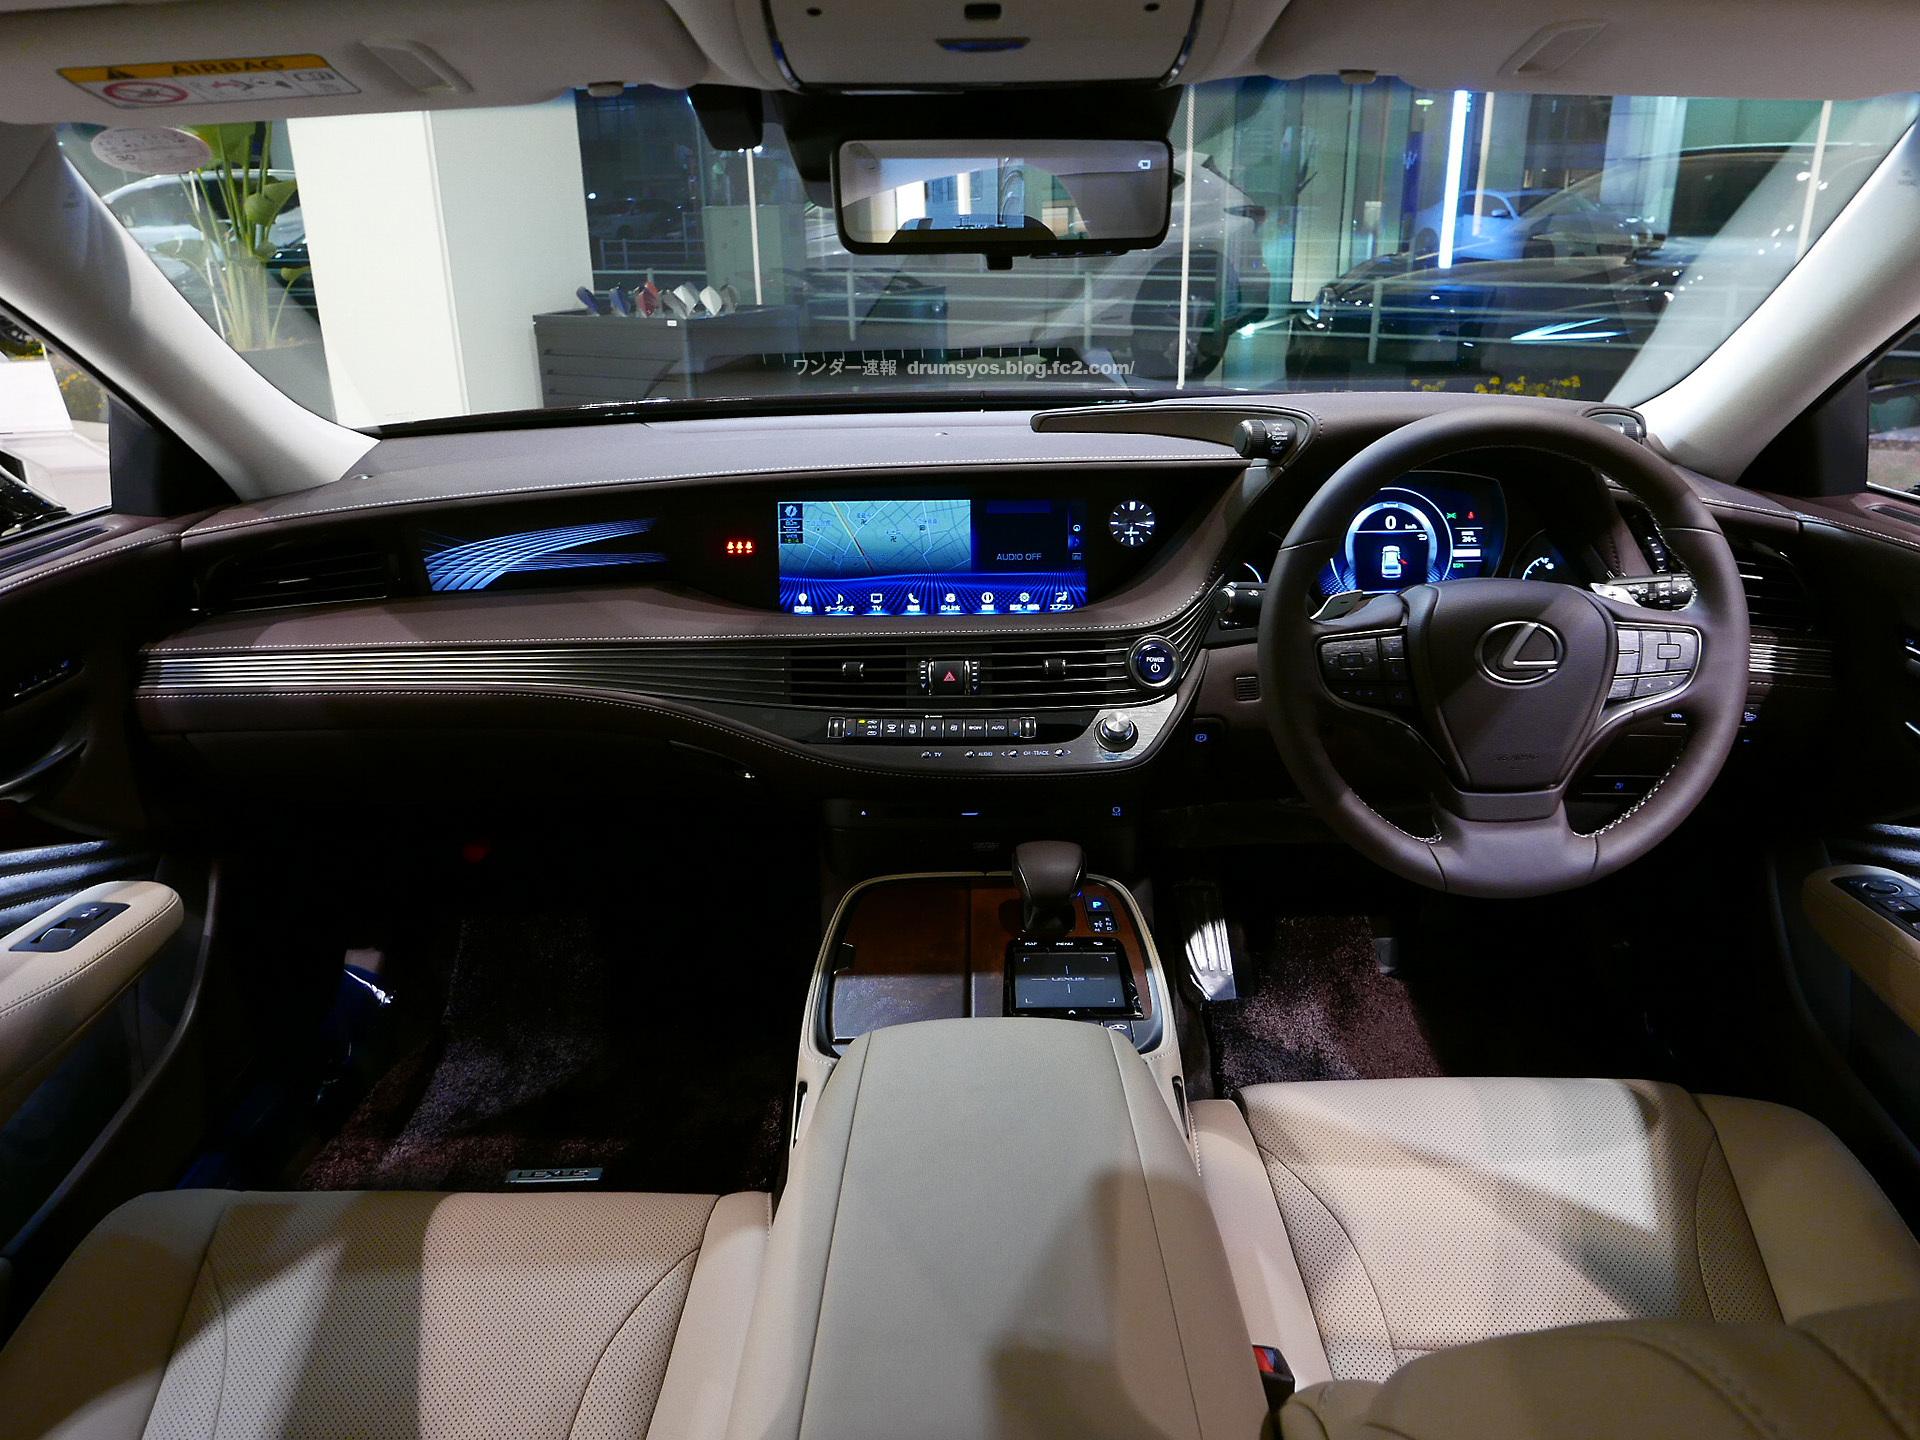 LexusLS500hI02_20180703154425743.jpg